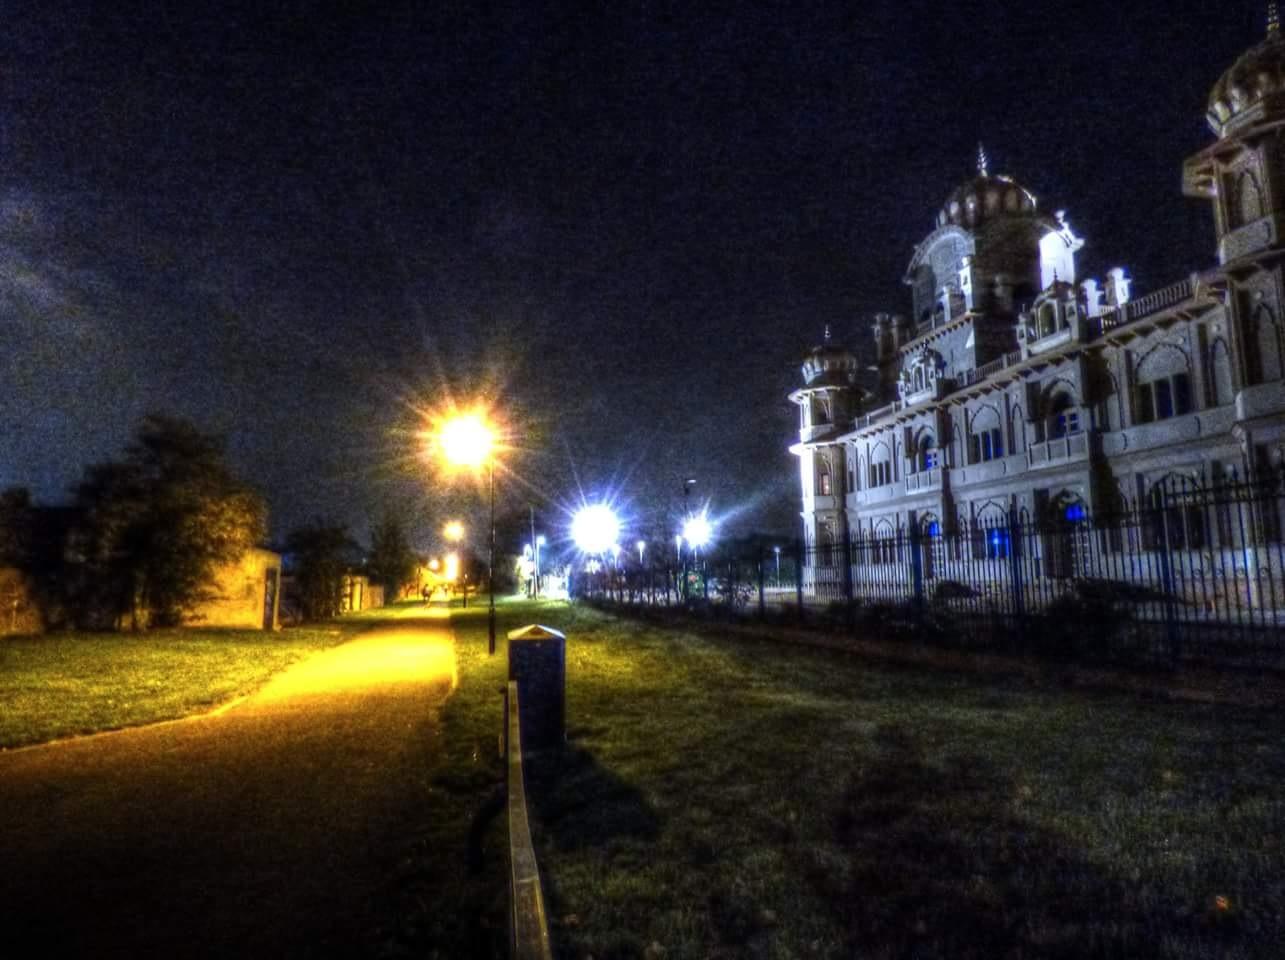 Gurdwara by night  by Steven Iodice